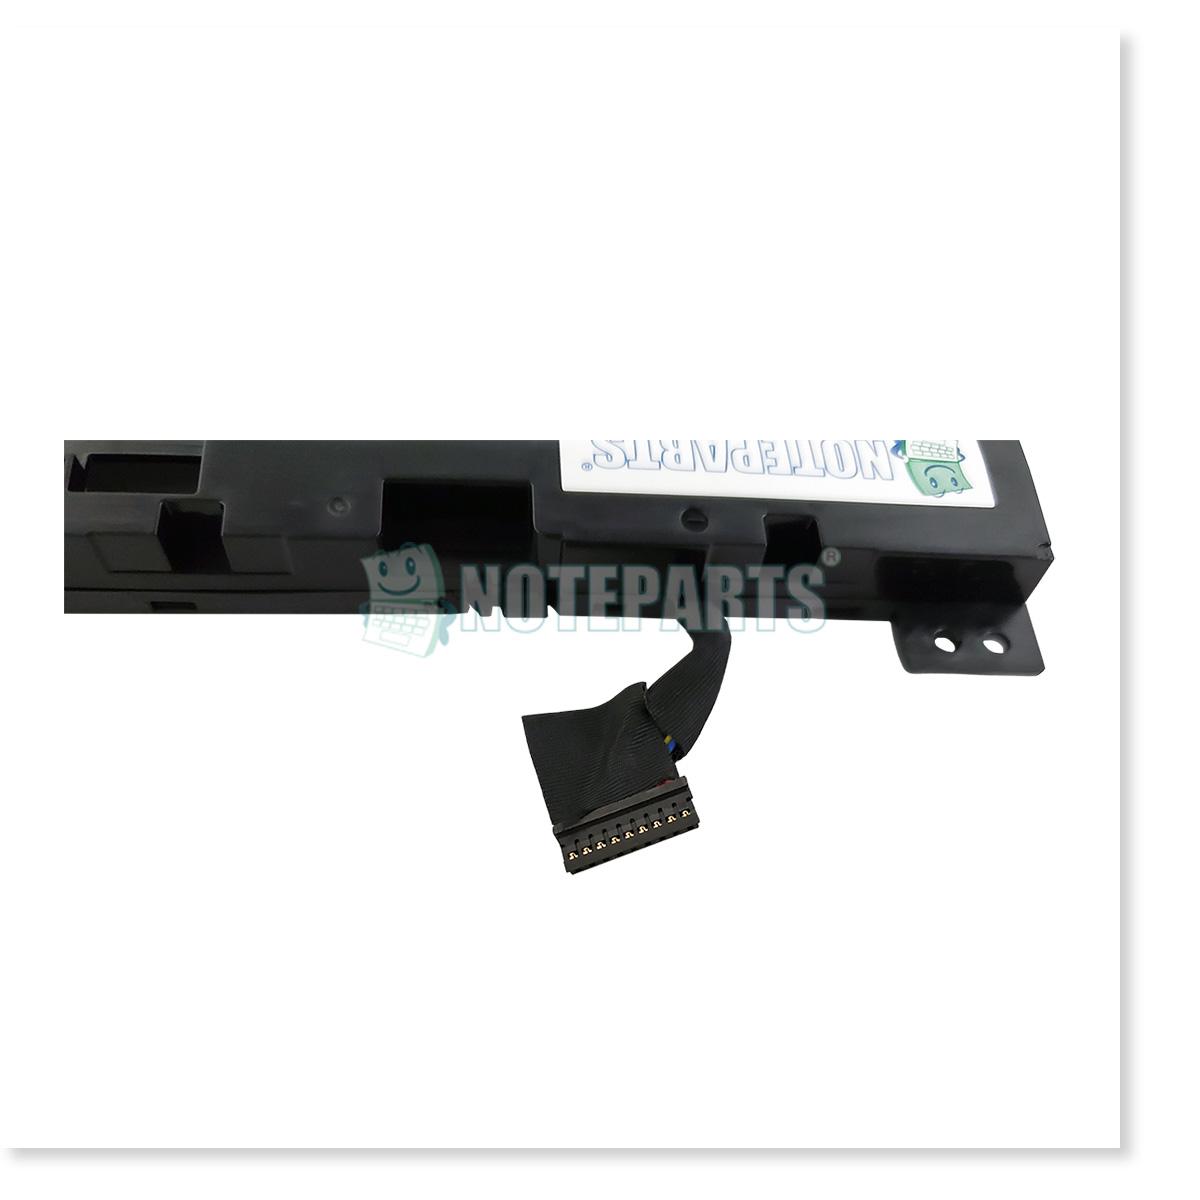 Dell デル Alienware 13 R2 QHD バッテリー 2VMGK 3V806 N1WM4対応